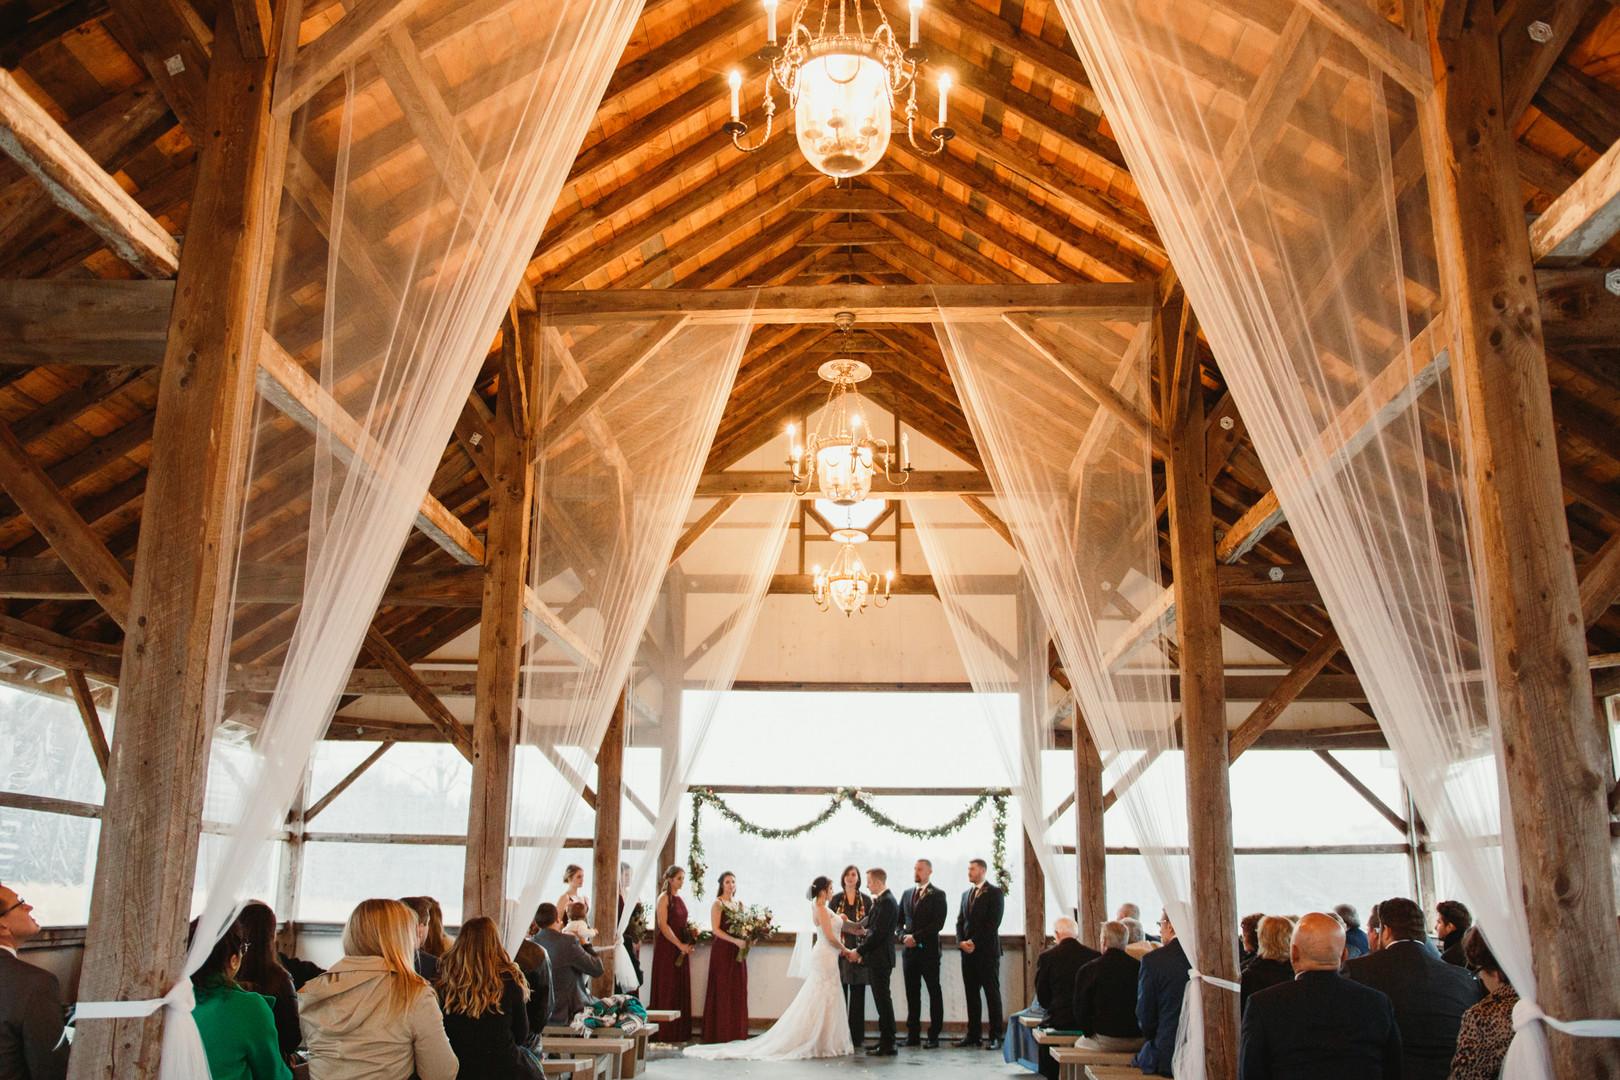 Valley-View-Farm-Winter-Wedding-3186.jpg